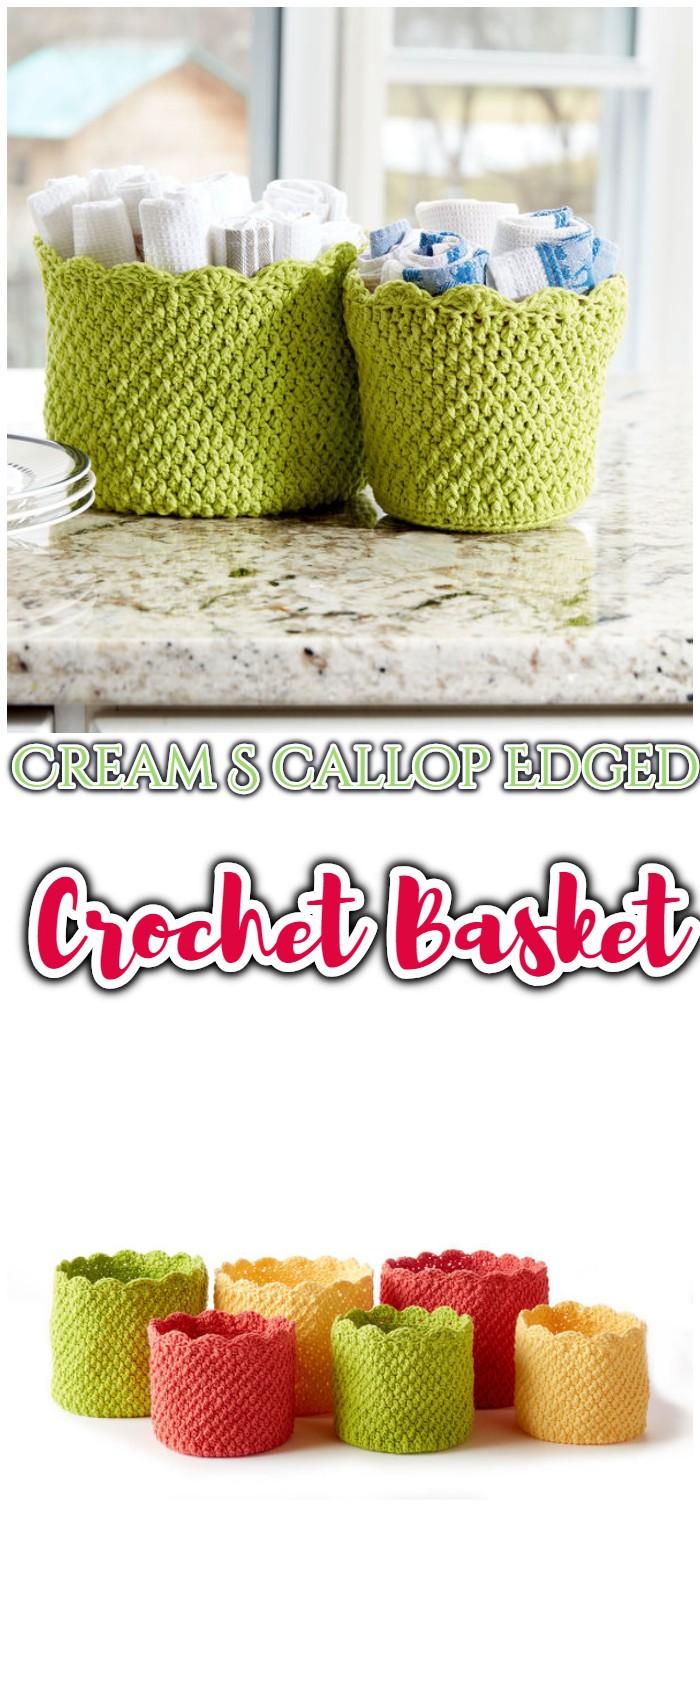 Cream Scallop Edged Crochet Baskets